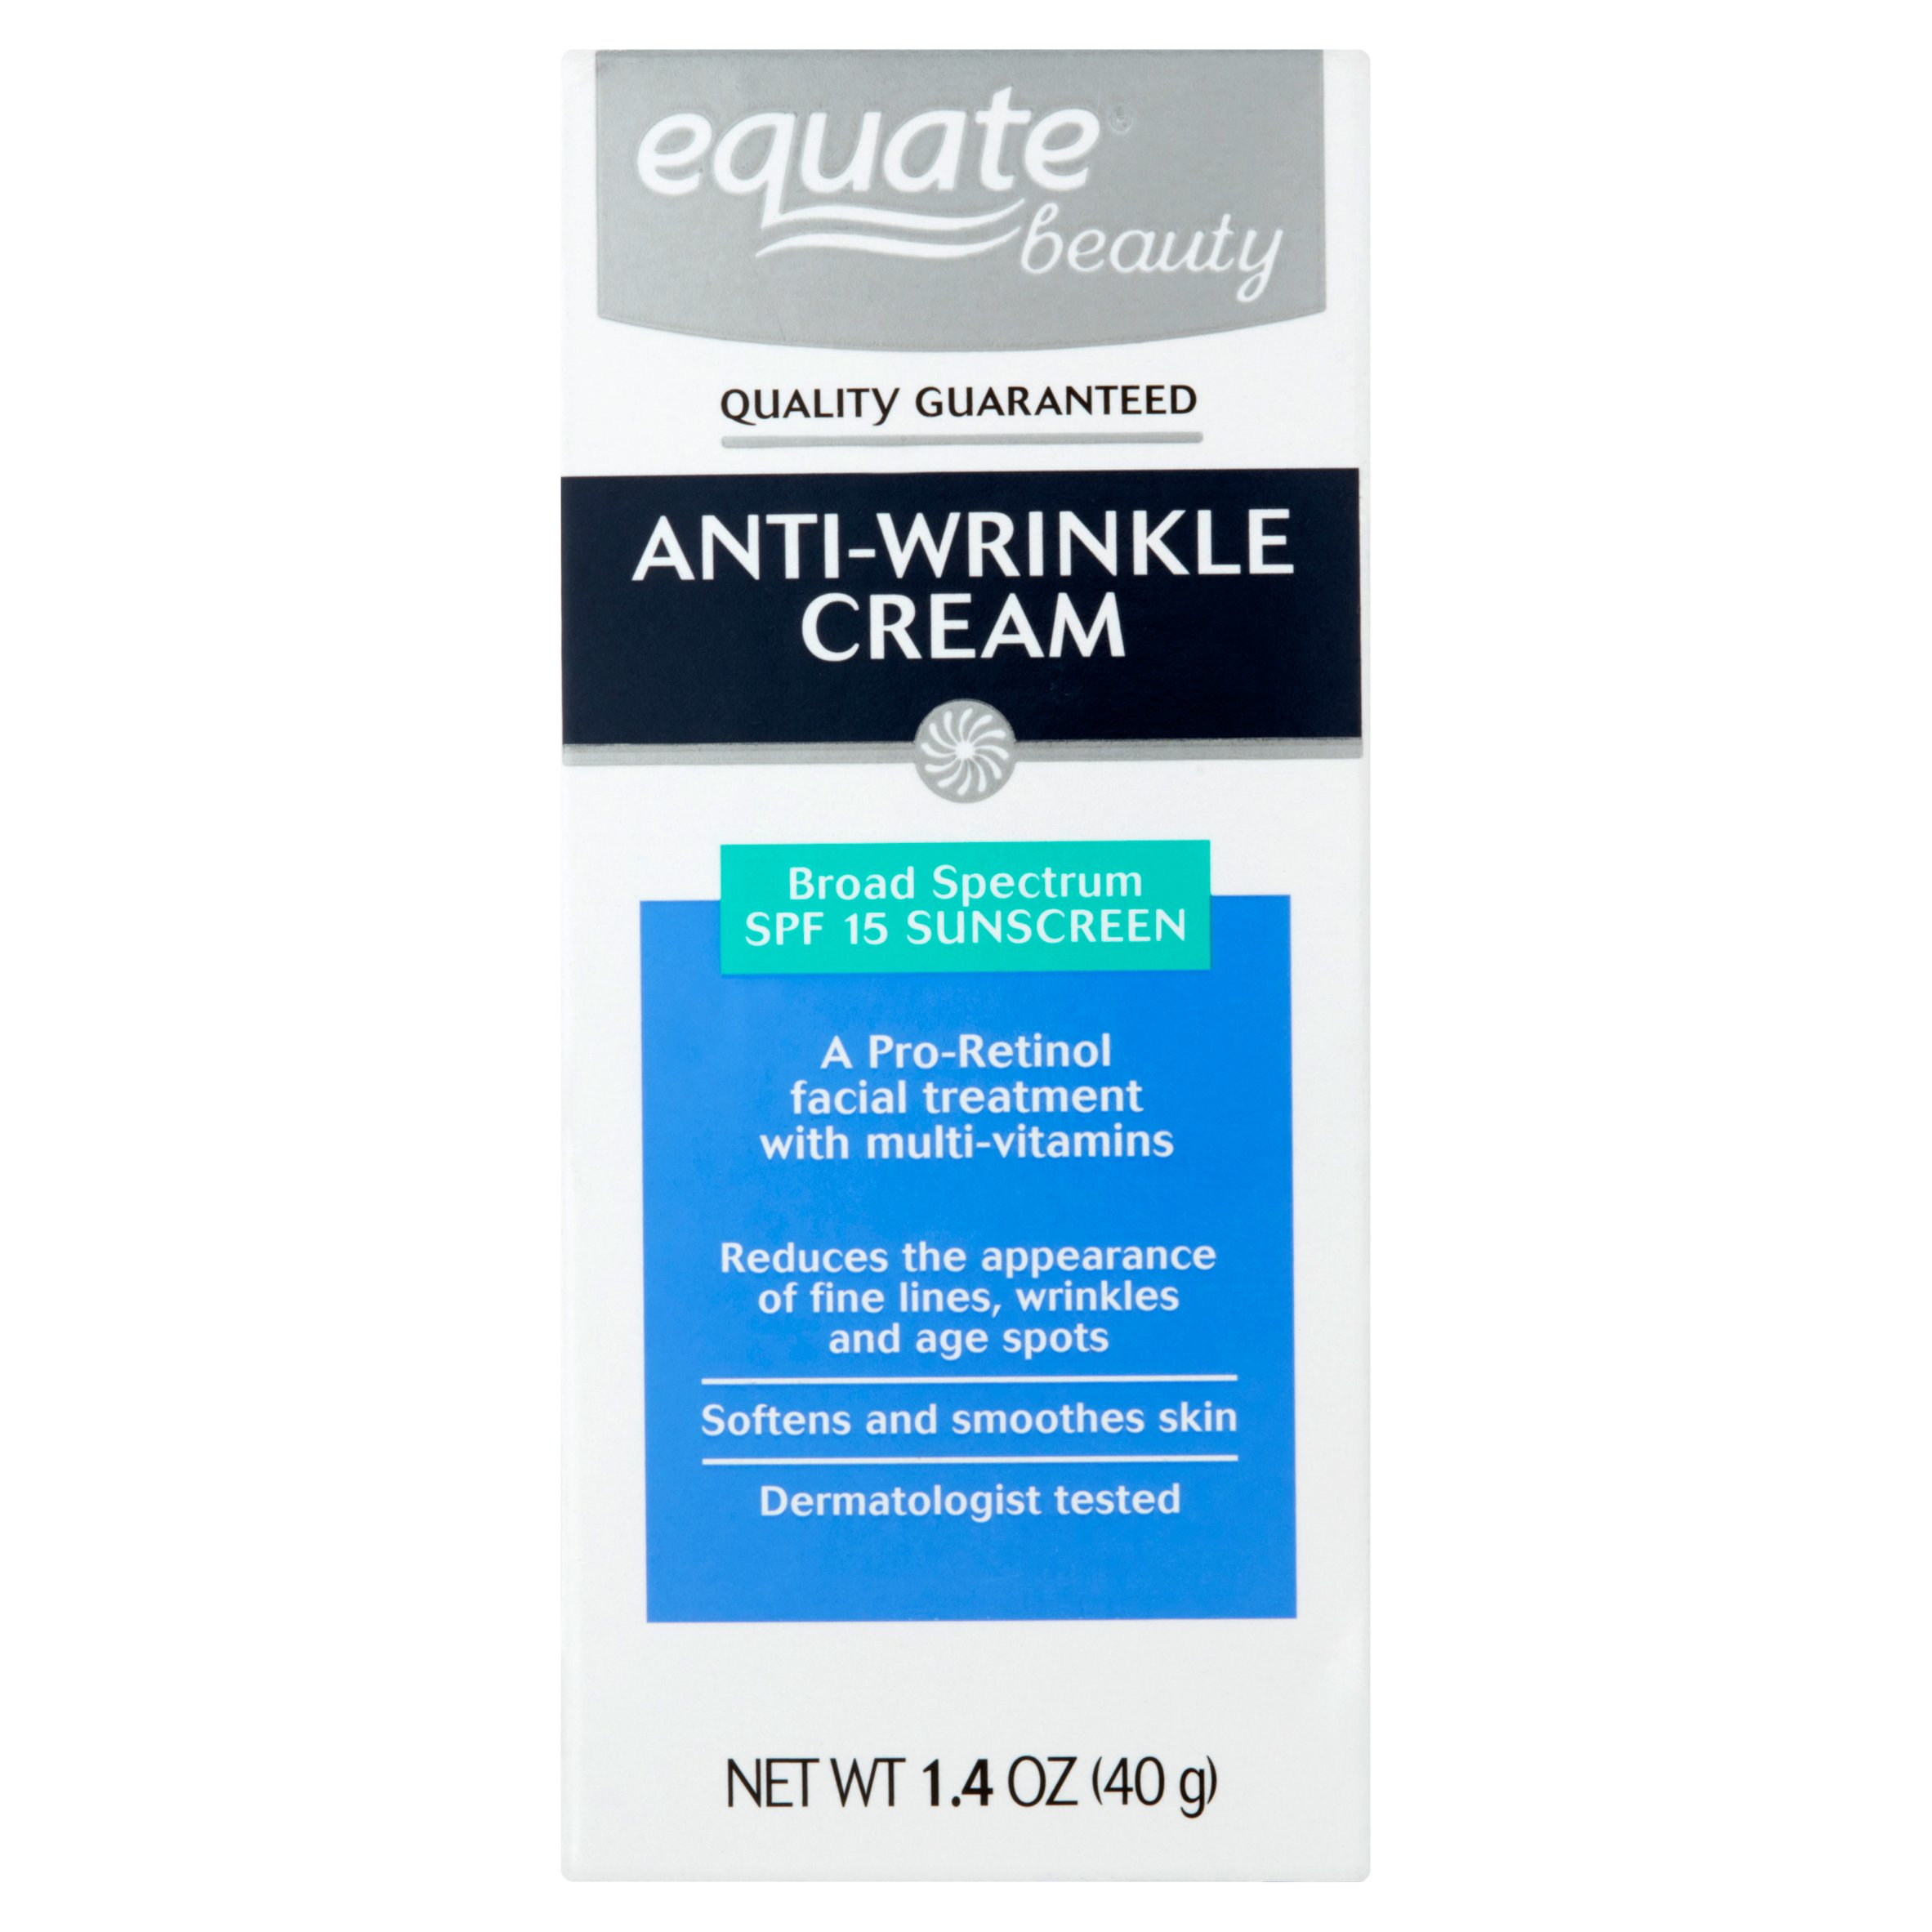 Equate Anti-Wrinkle Cream SPF 15, 1.4 Oz